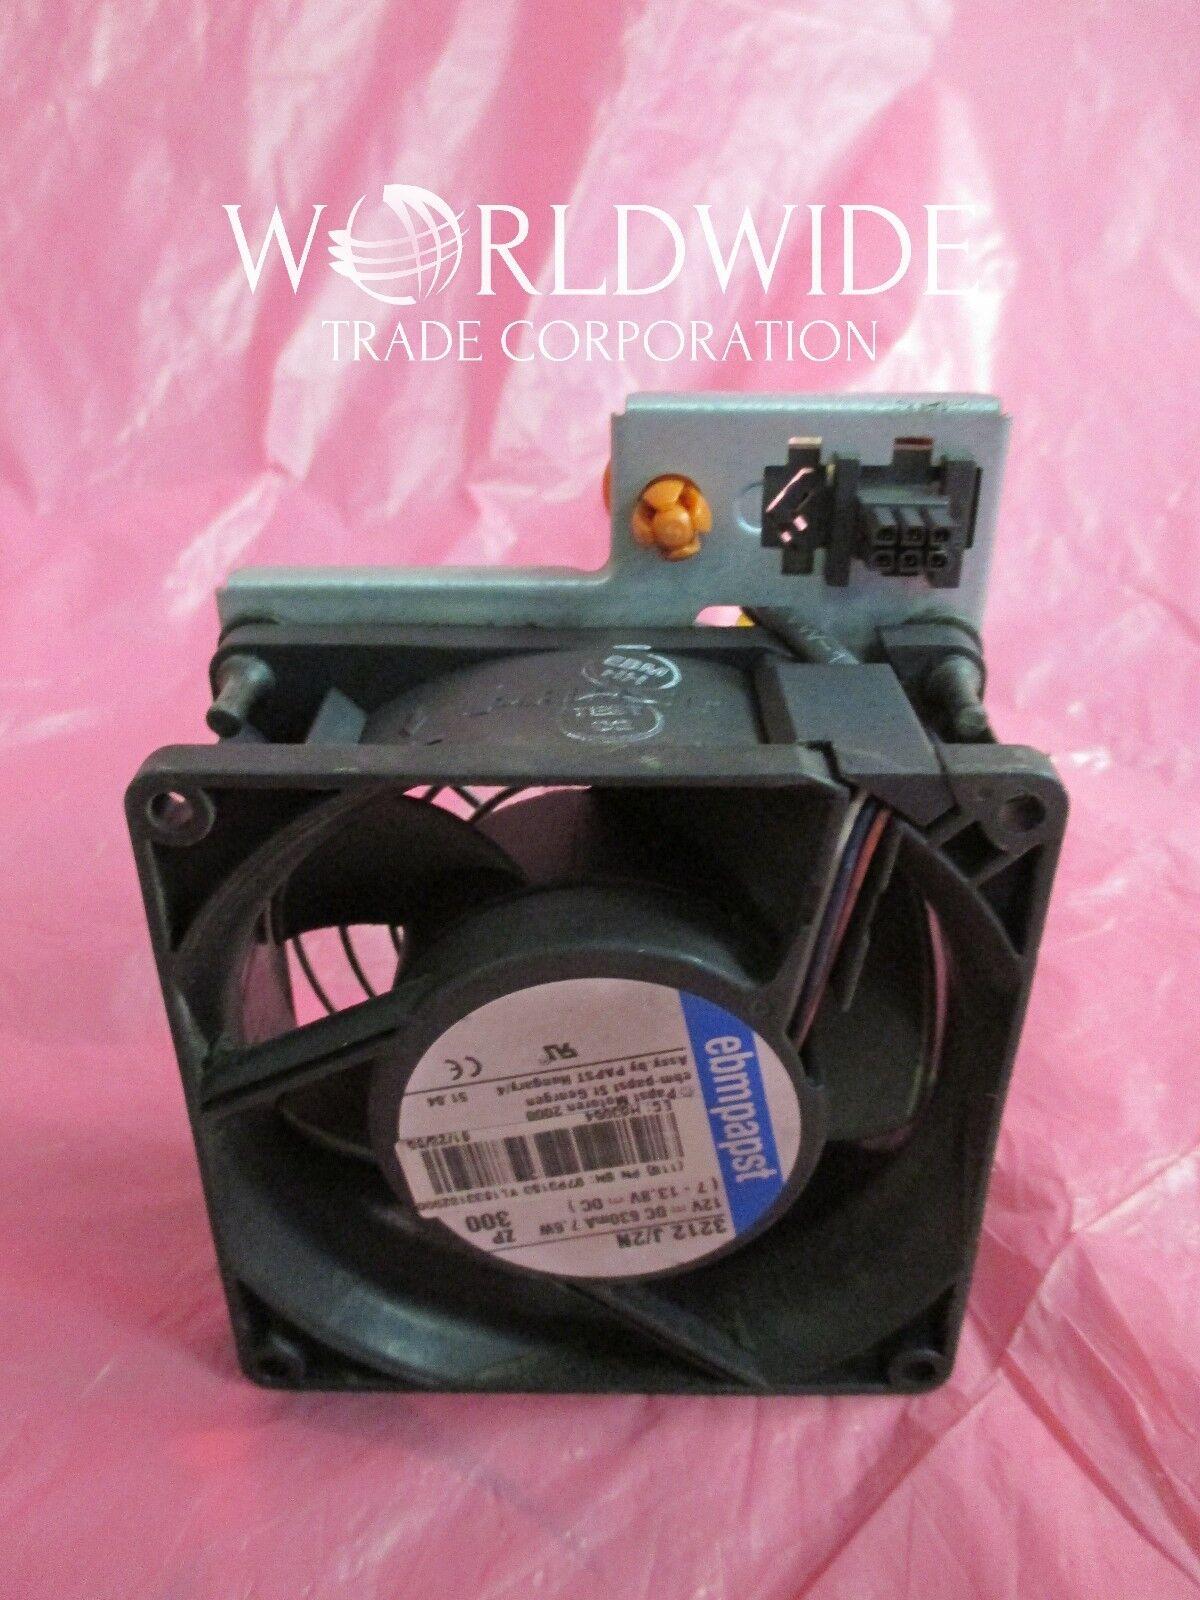 IBM 97P3153 Quiet Fan 6B18 for 7029 9111 9114 9131 9406 9407 pSeries//iSeries